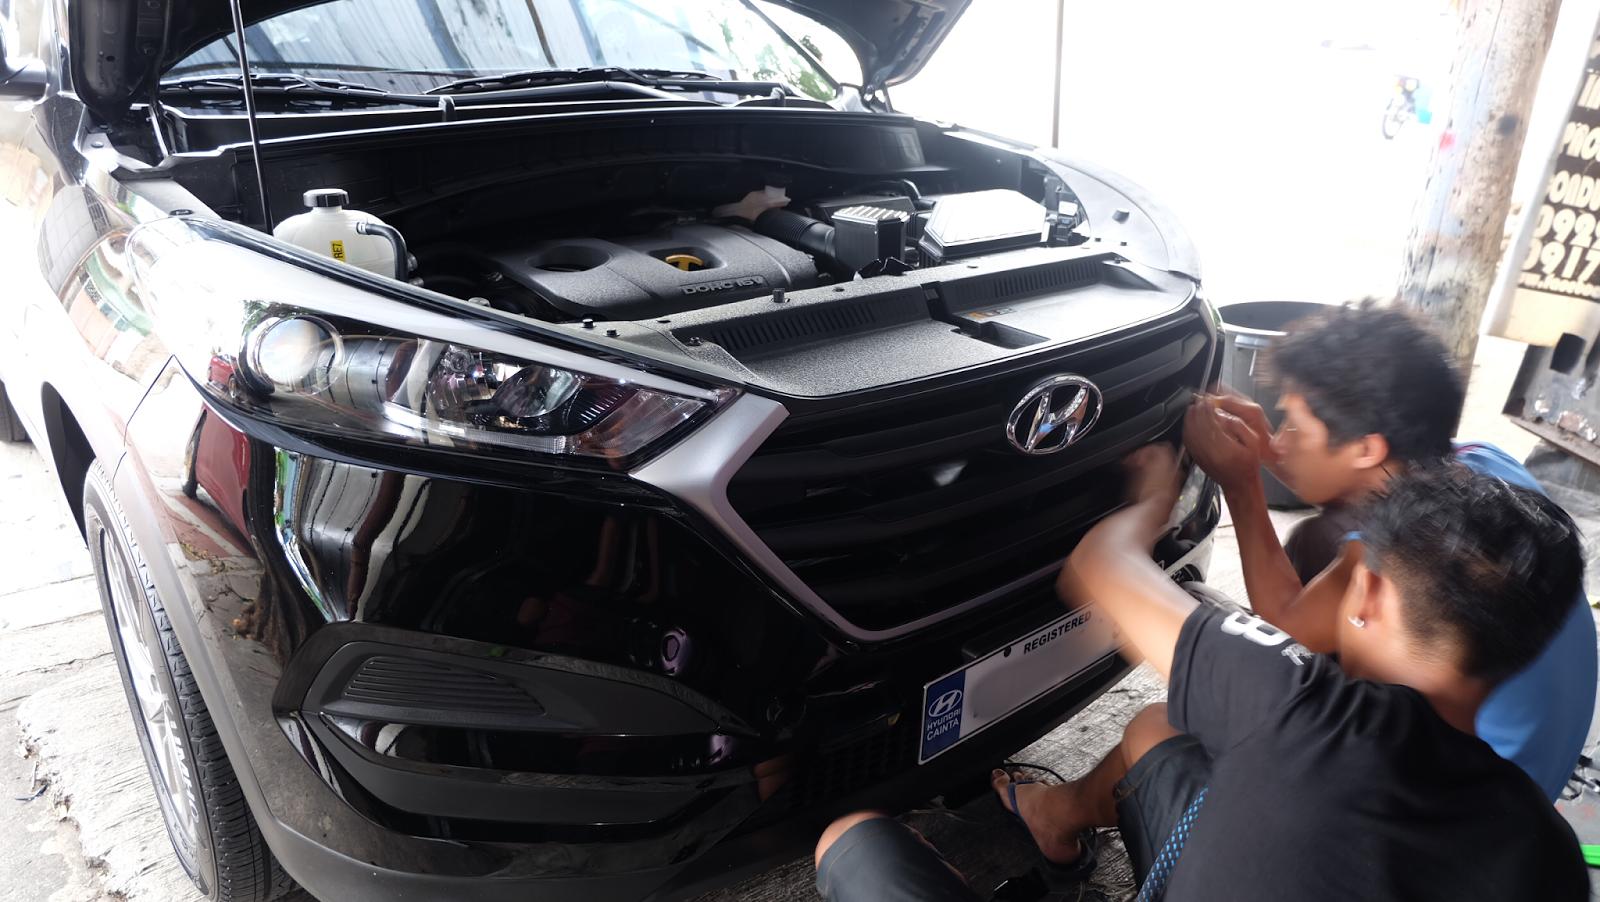 Road to stealthy look : Matte black vinyl wrap on Hyundai